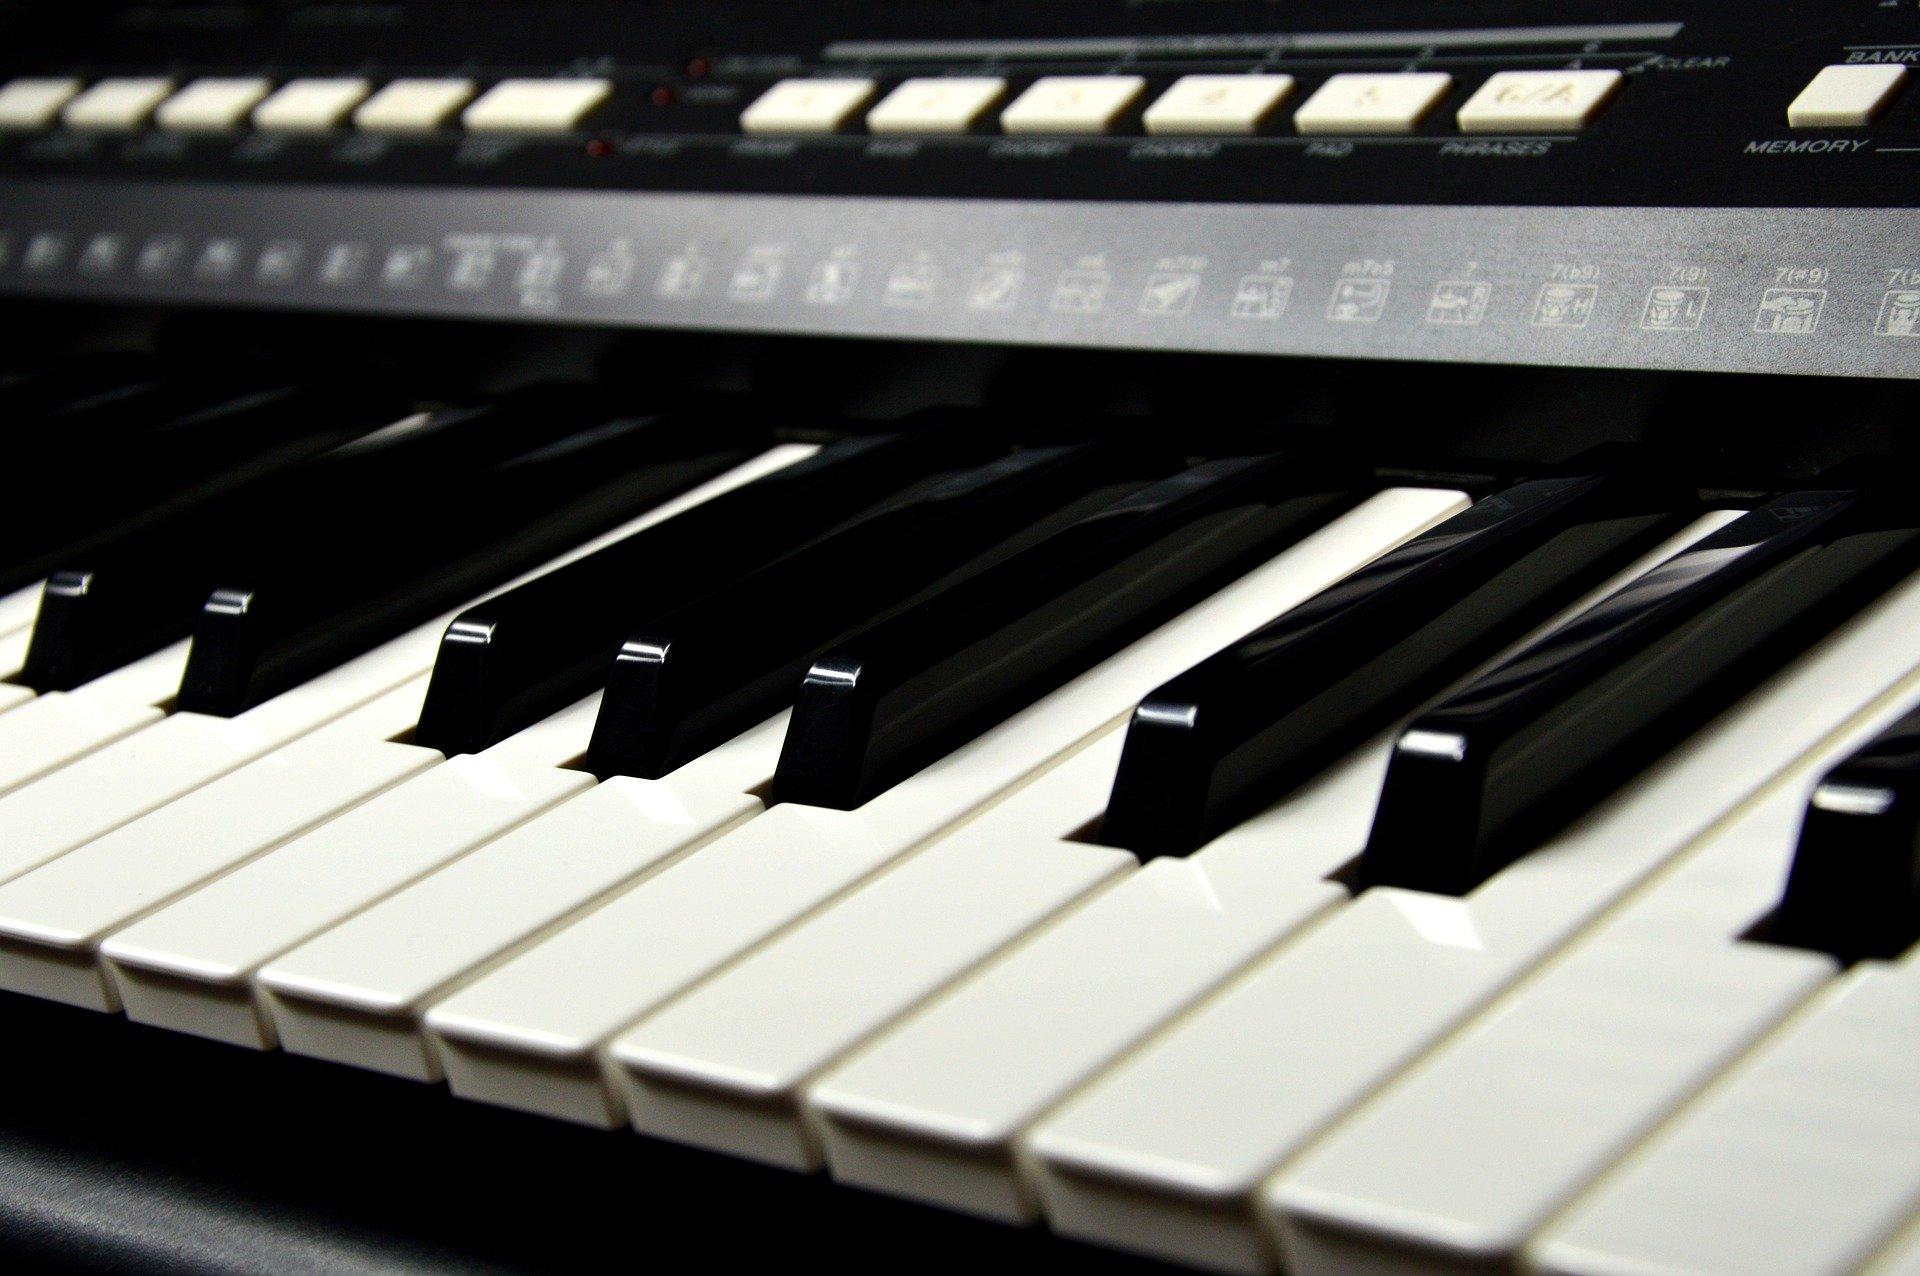 piano keyboard keys key electronic cheap pianos musical sheet portable пианино клавиатура картинка songs instrument beginners roland computer pianino digital